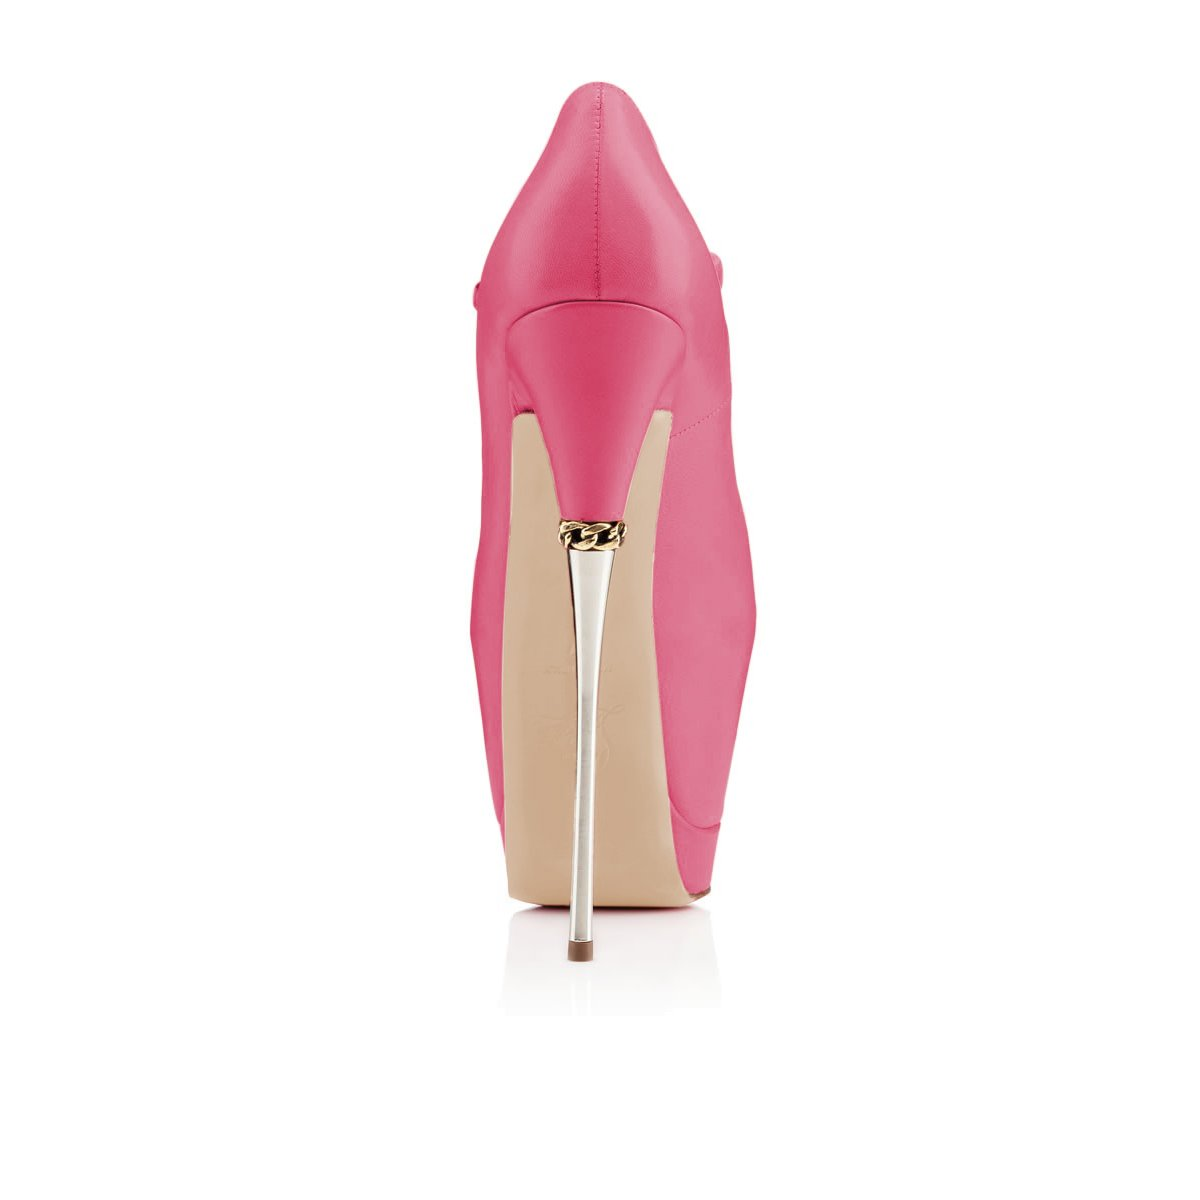 YDN Women Peep Toe Sky High Heels Platform Pumps Ankle Straps Shoes Metal Stilettos B07F1R7JV8 8 M US Rossy-pu